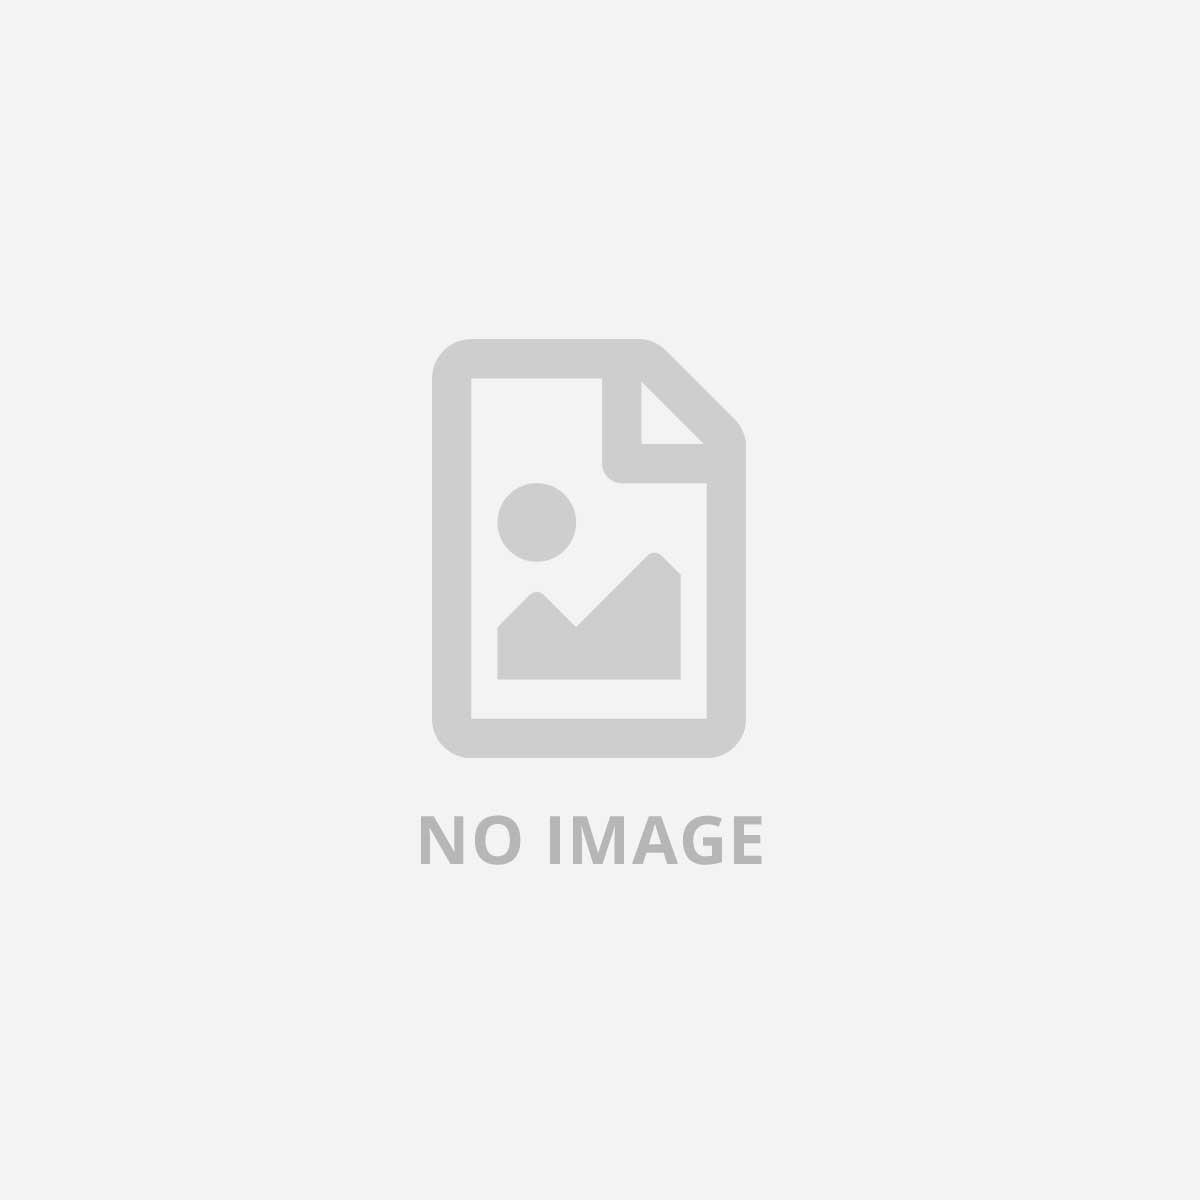 HAMLET EXAGERATE CAM SKUBA HD 720P